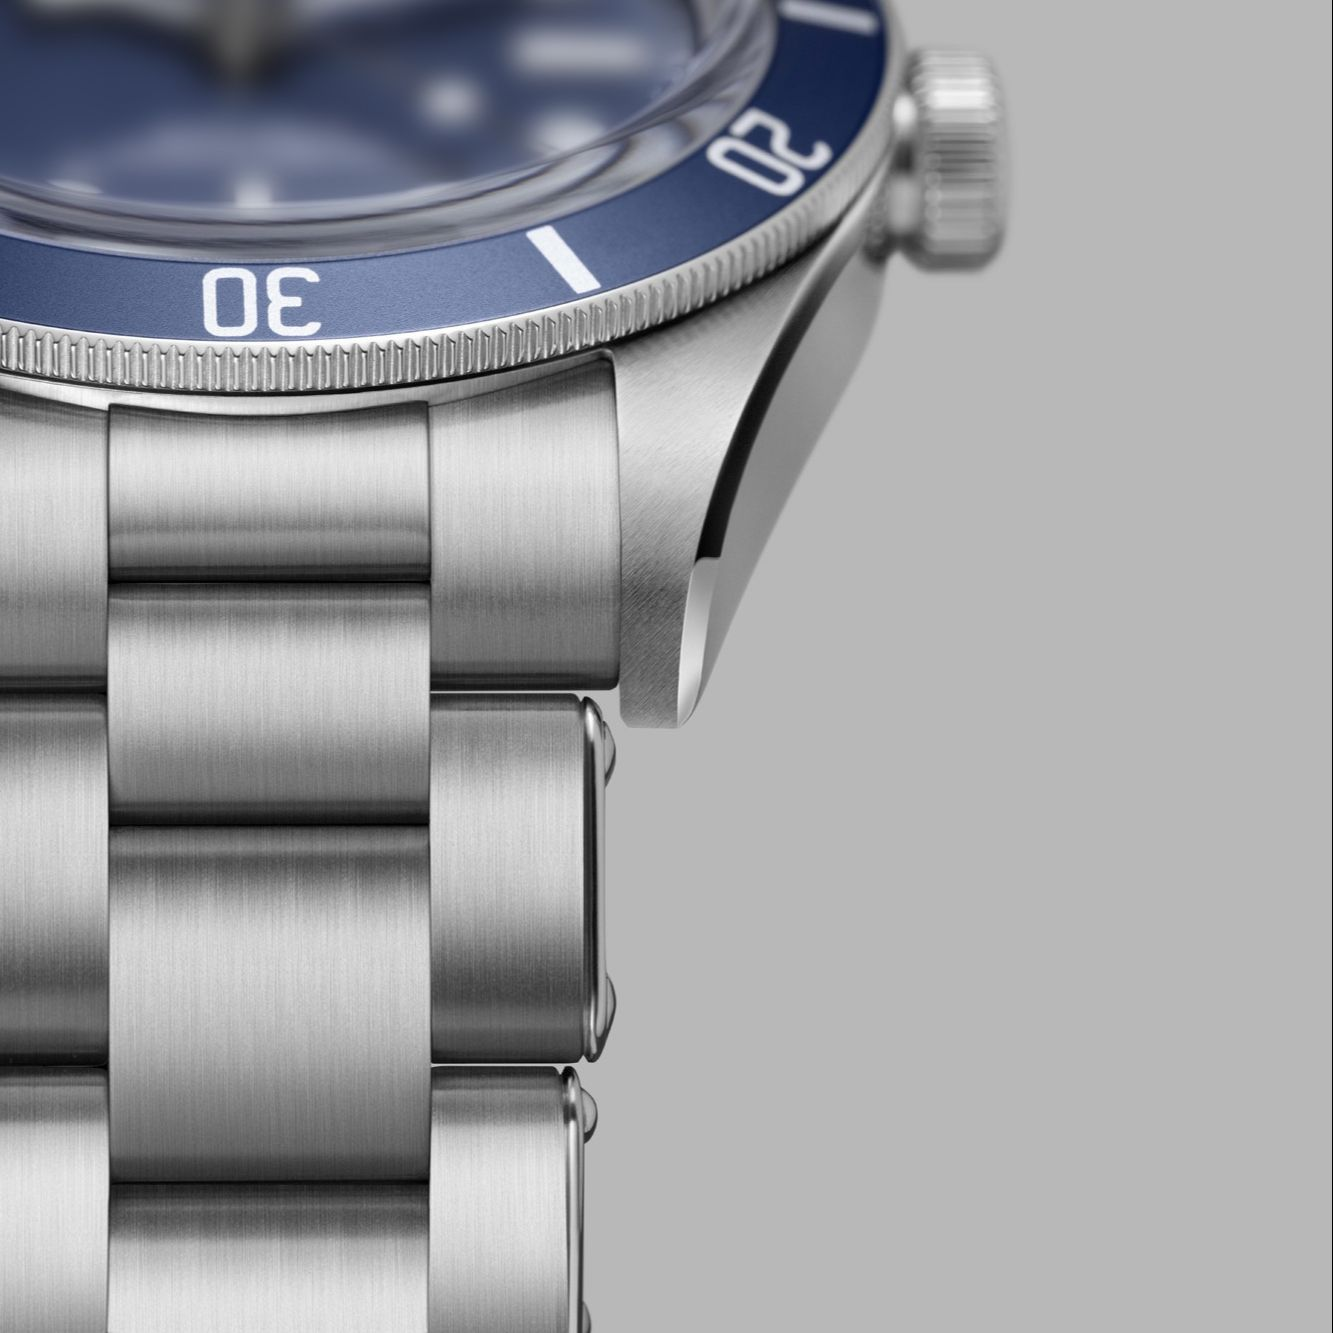 2021 New PAGANI DESIGN BB58 Men's Watches Mechanical Watch For Men Luxury Automatic Watch Men NH35/8215 Waterproof Reloj Hombre 4